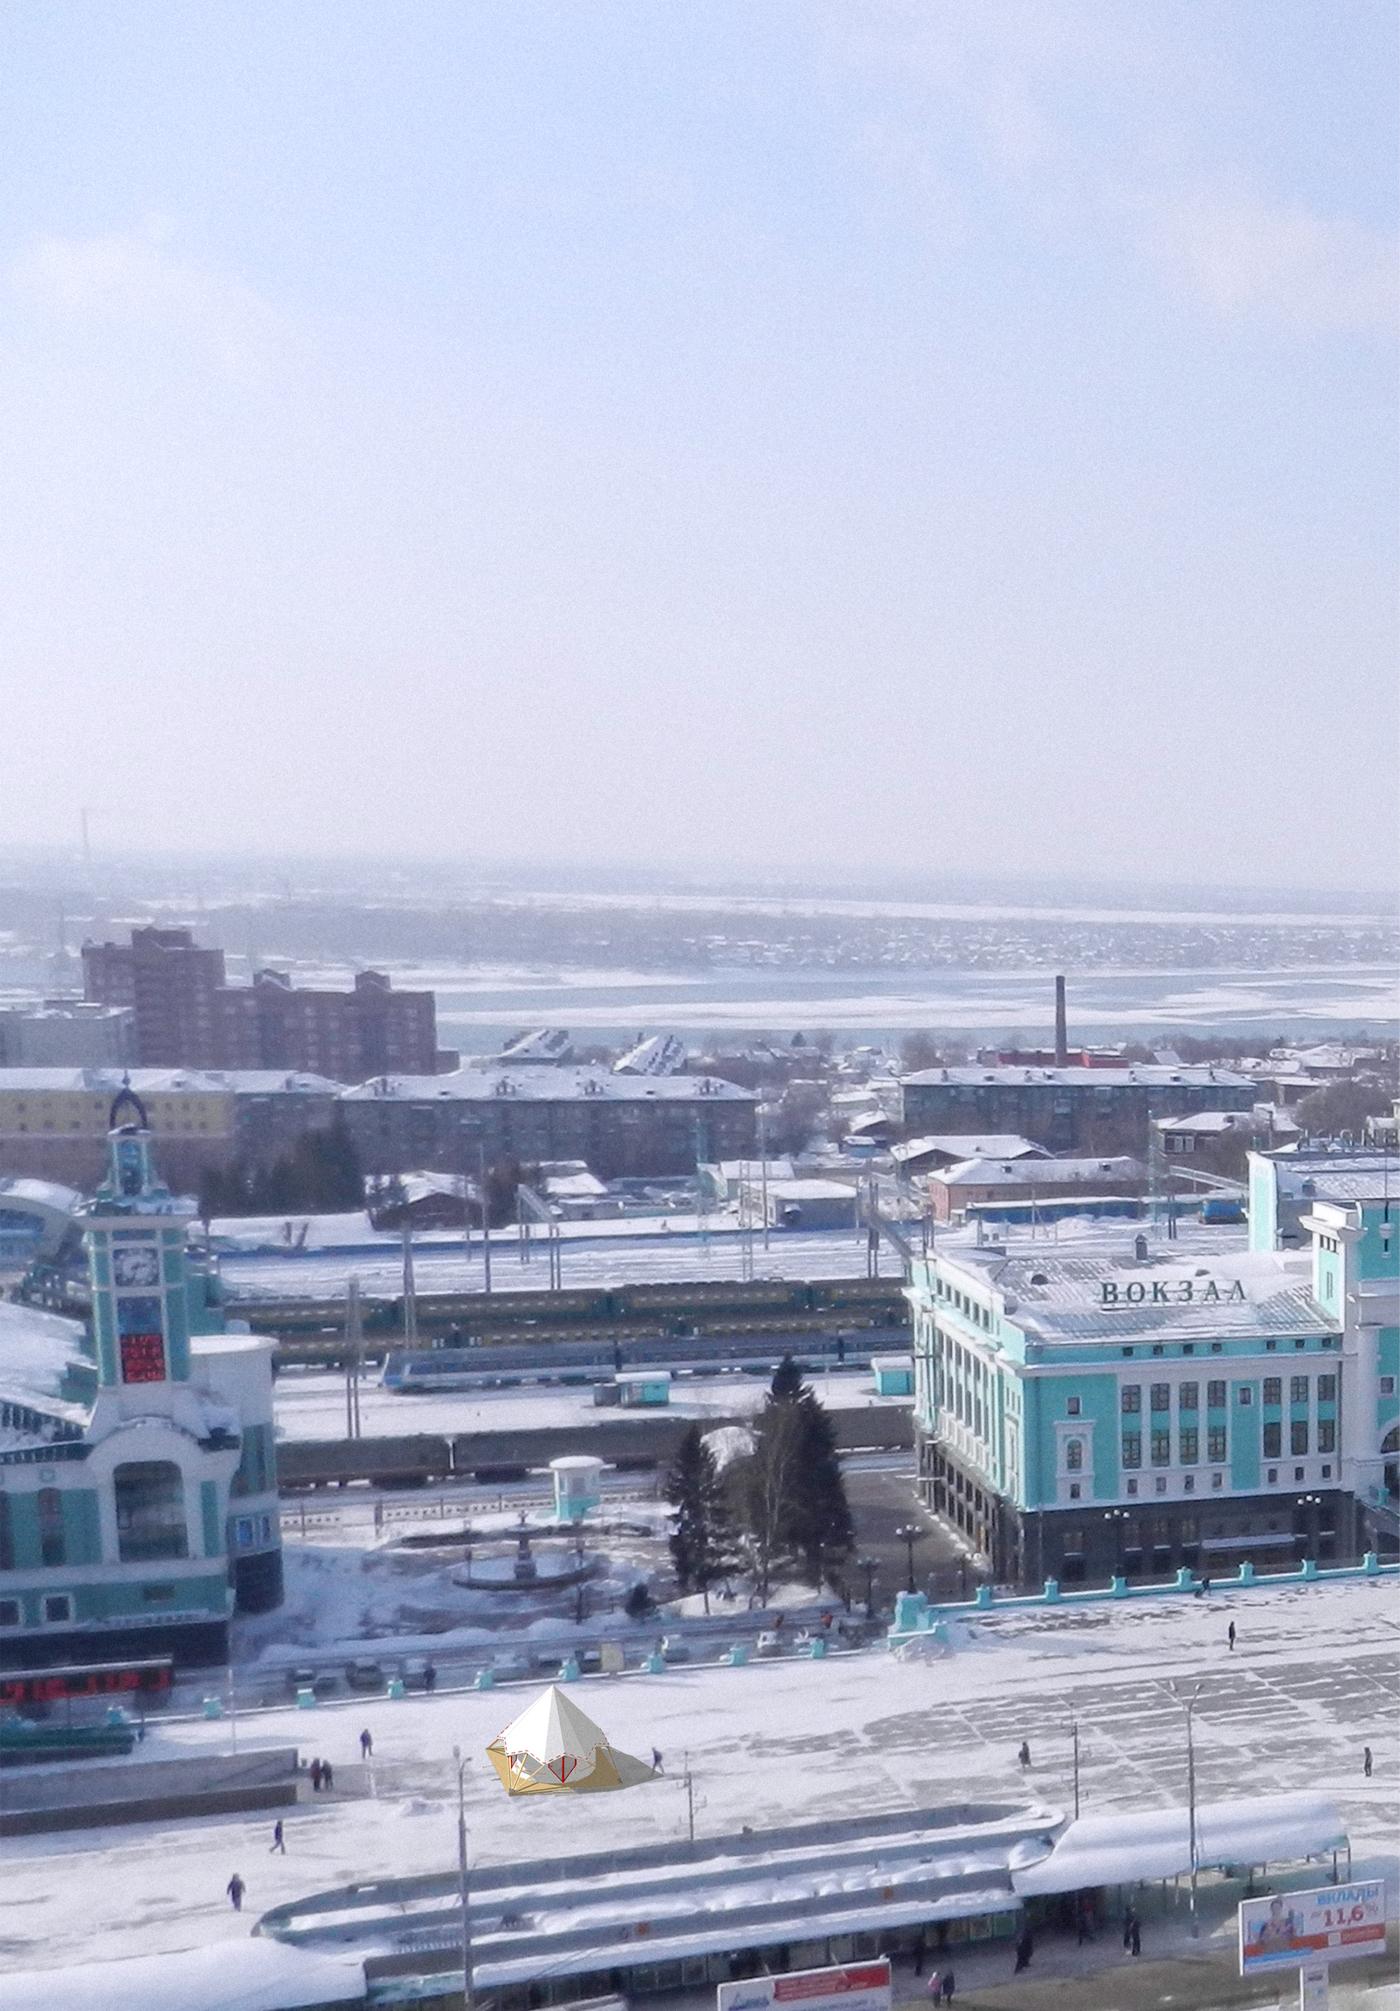 008_High-Altitude-View.jpg